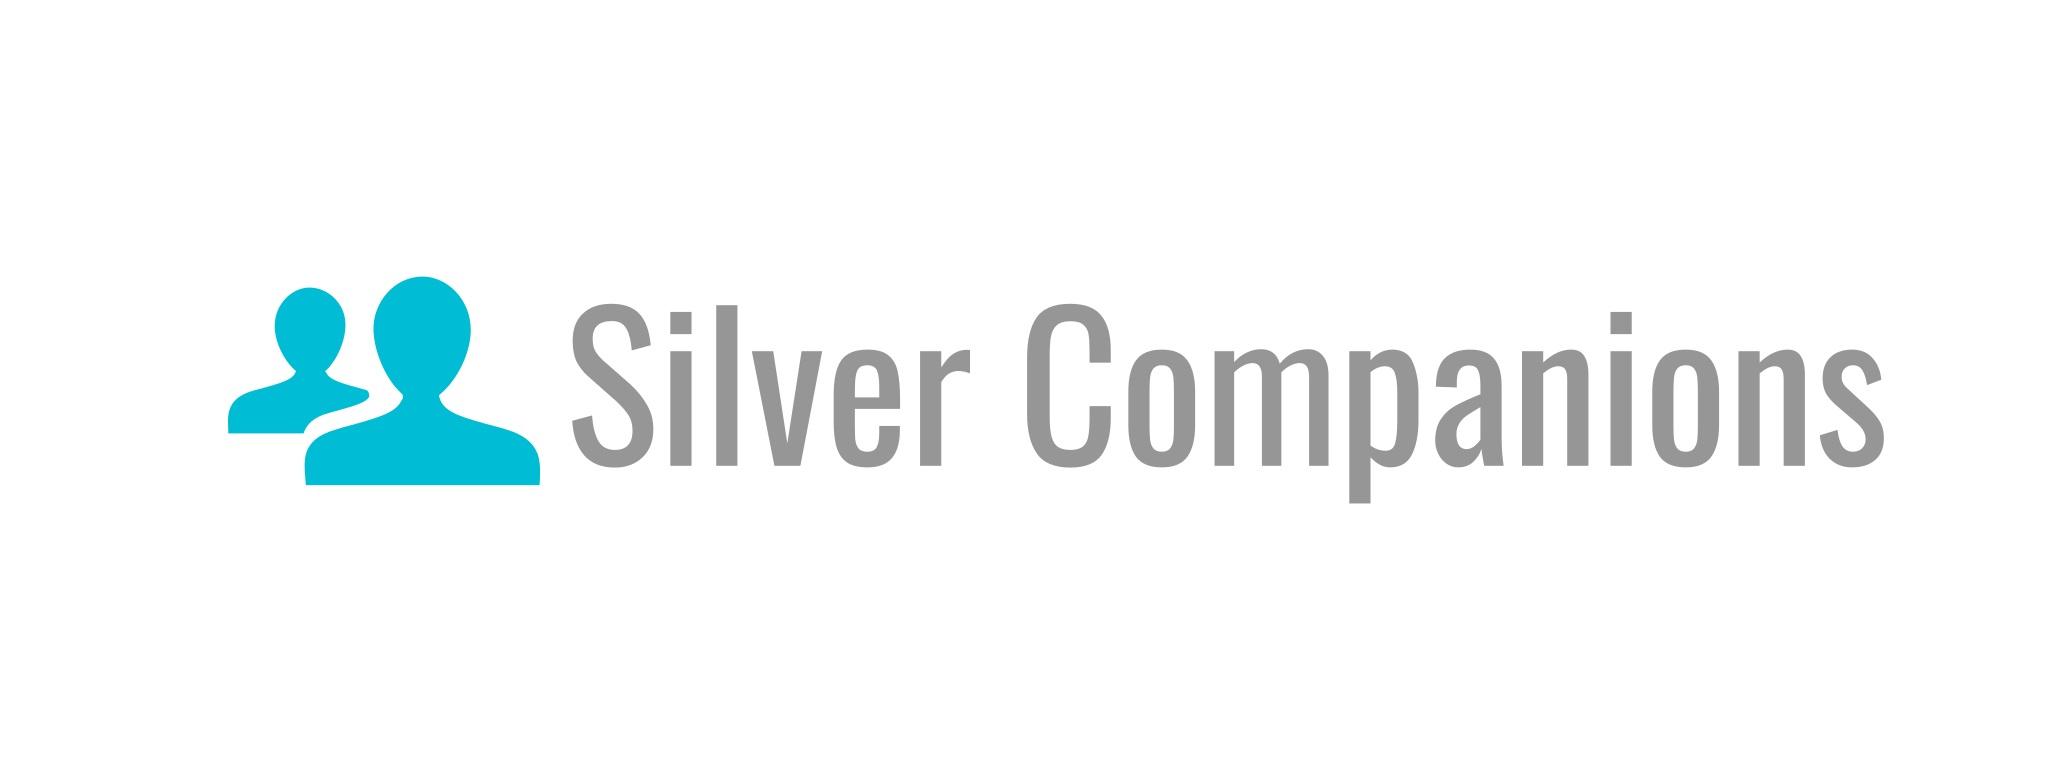 silver-companions-large-jpeg.jpg